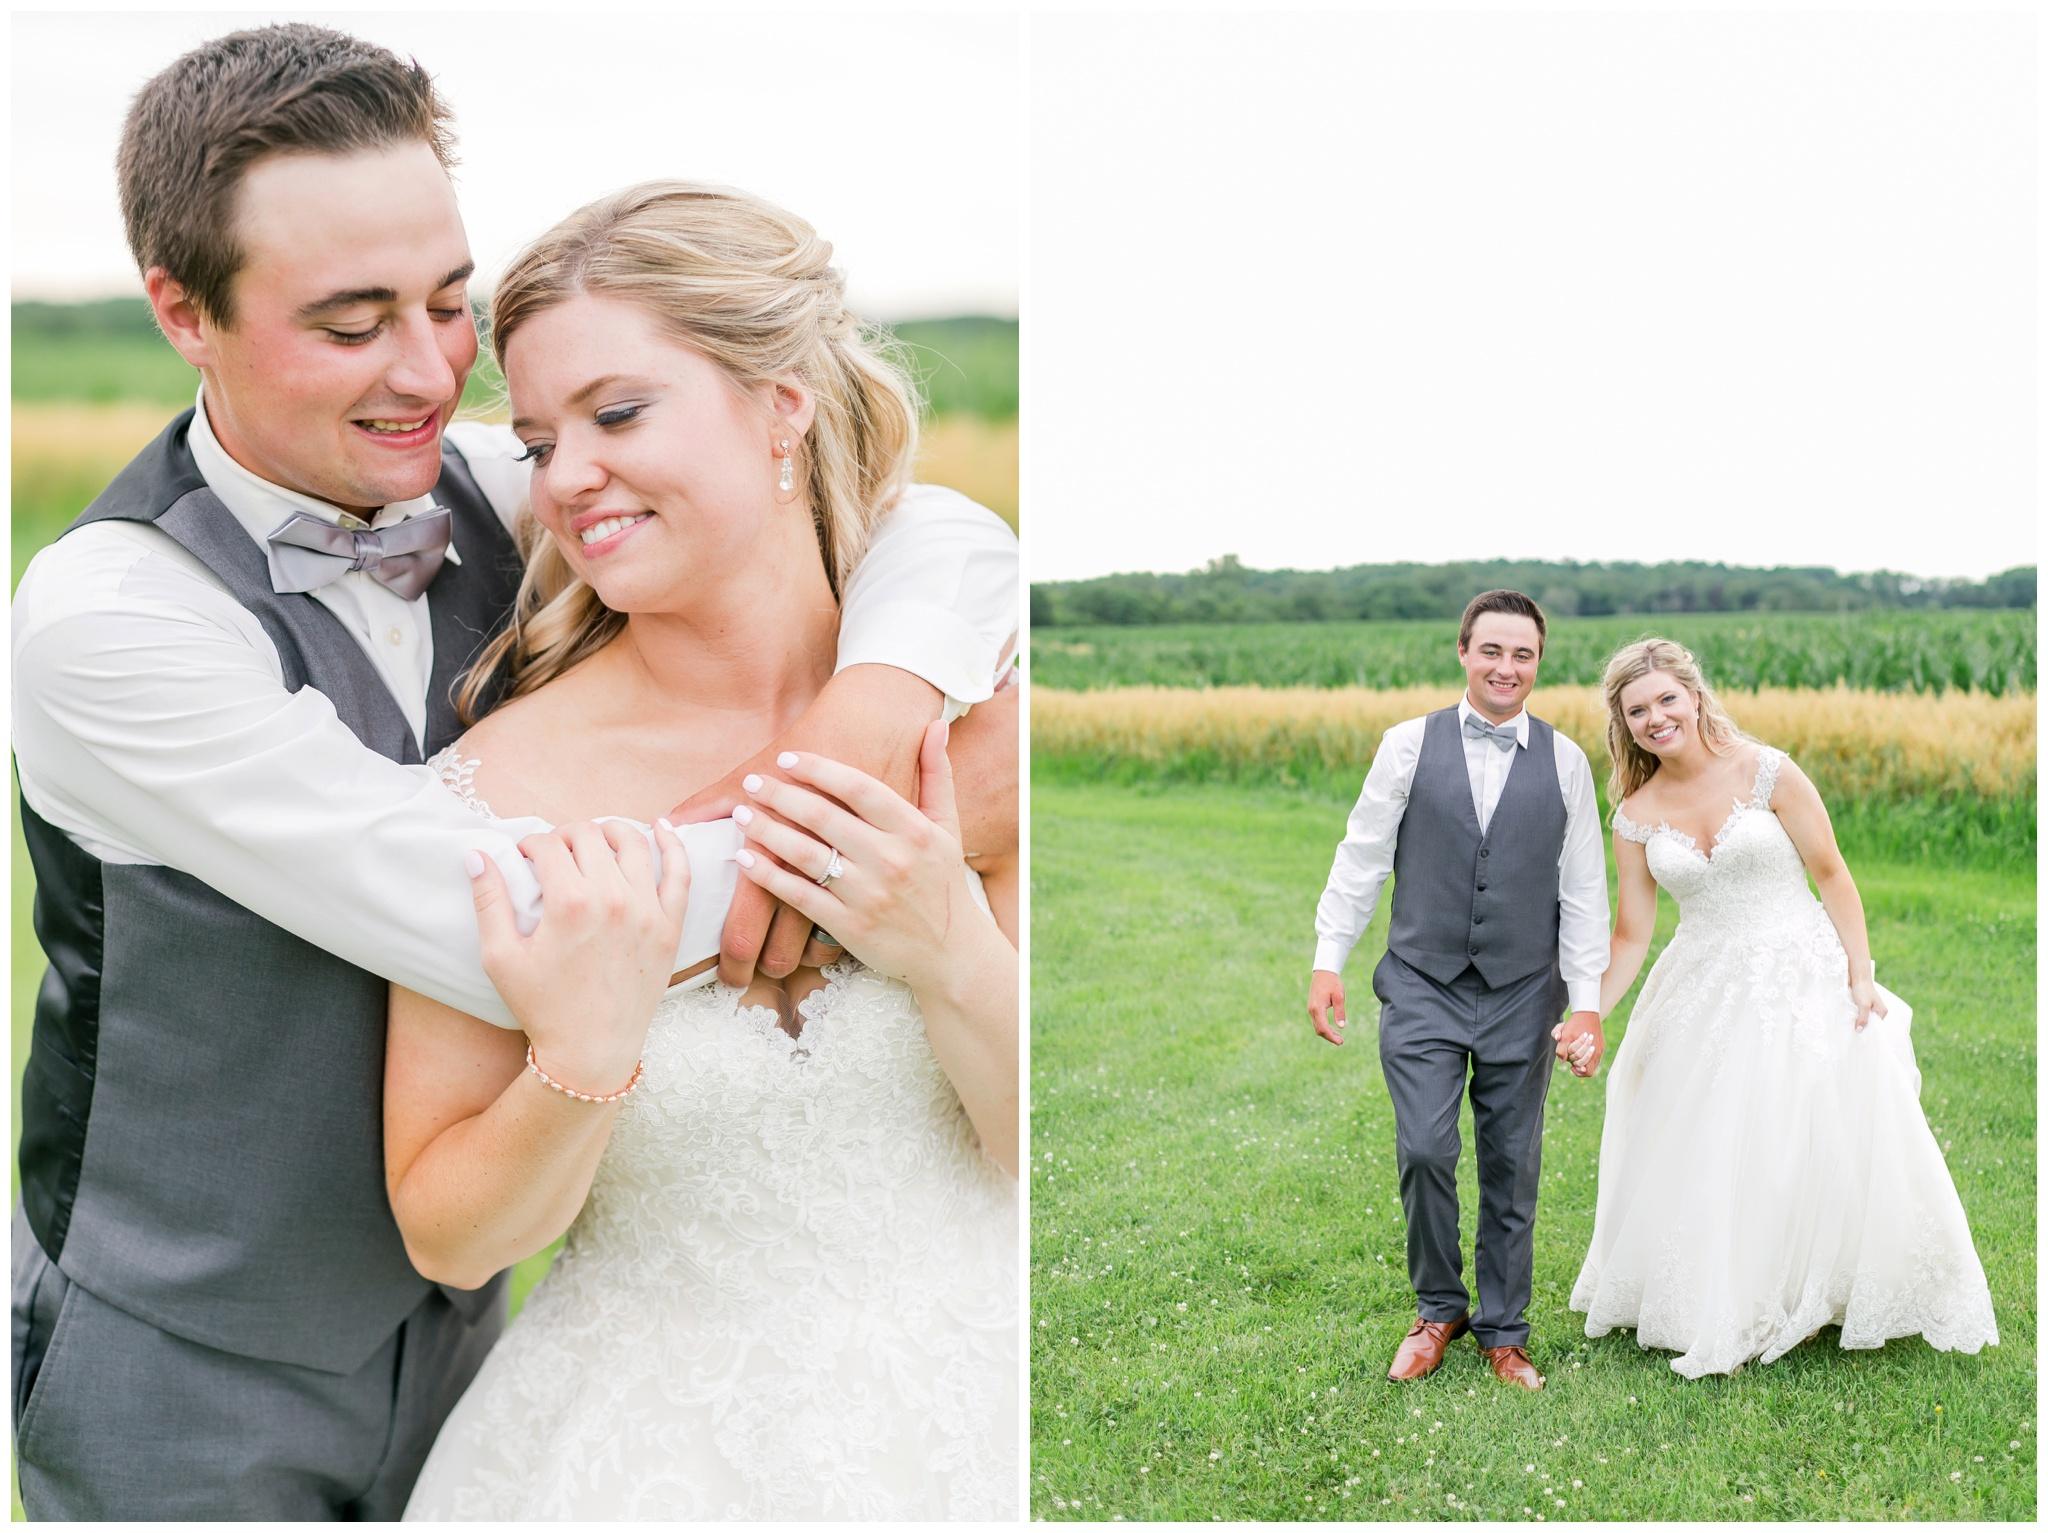 Sugarland_barn_arena_wisconsin_wedding_madison_wisconsin_4289.jpg